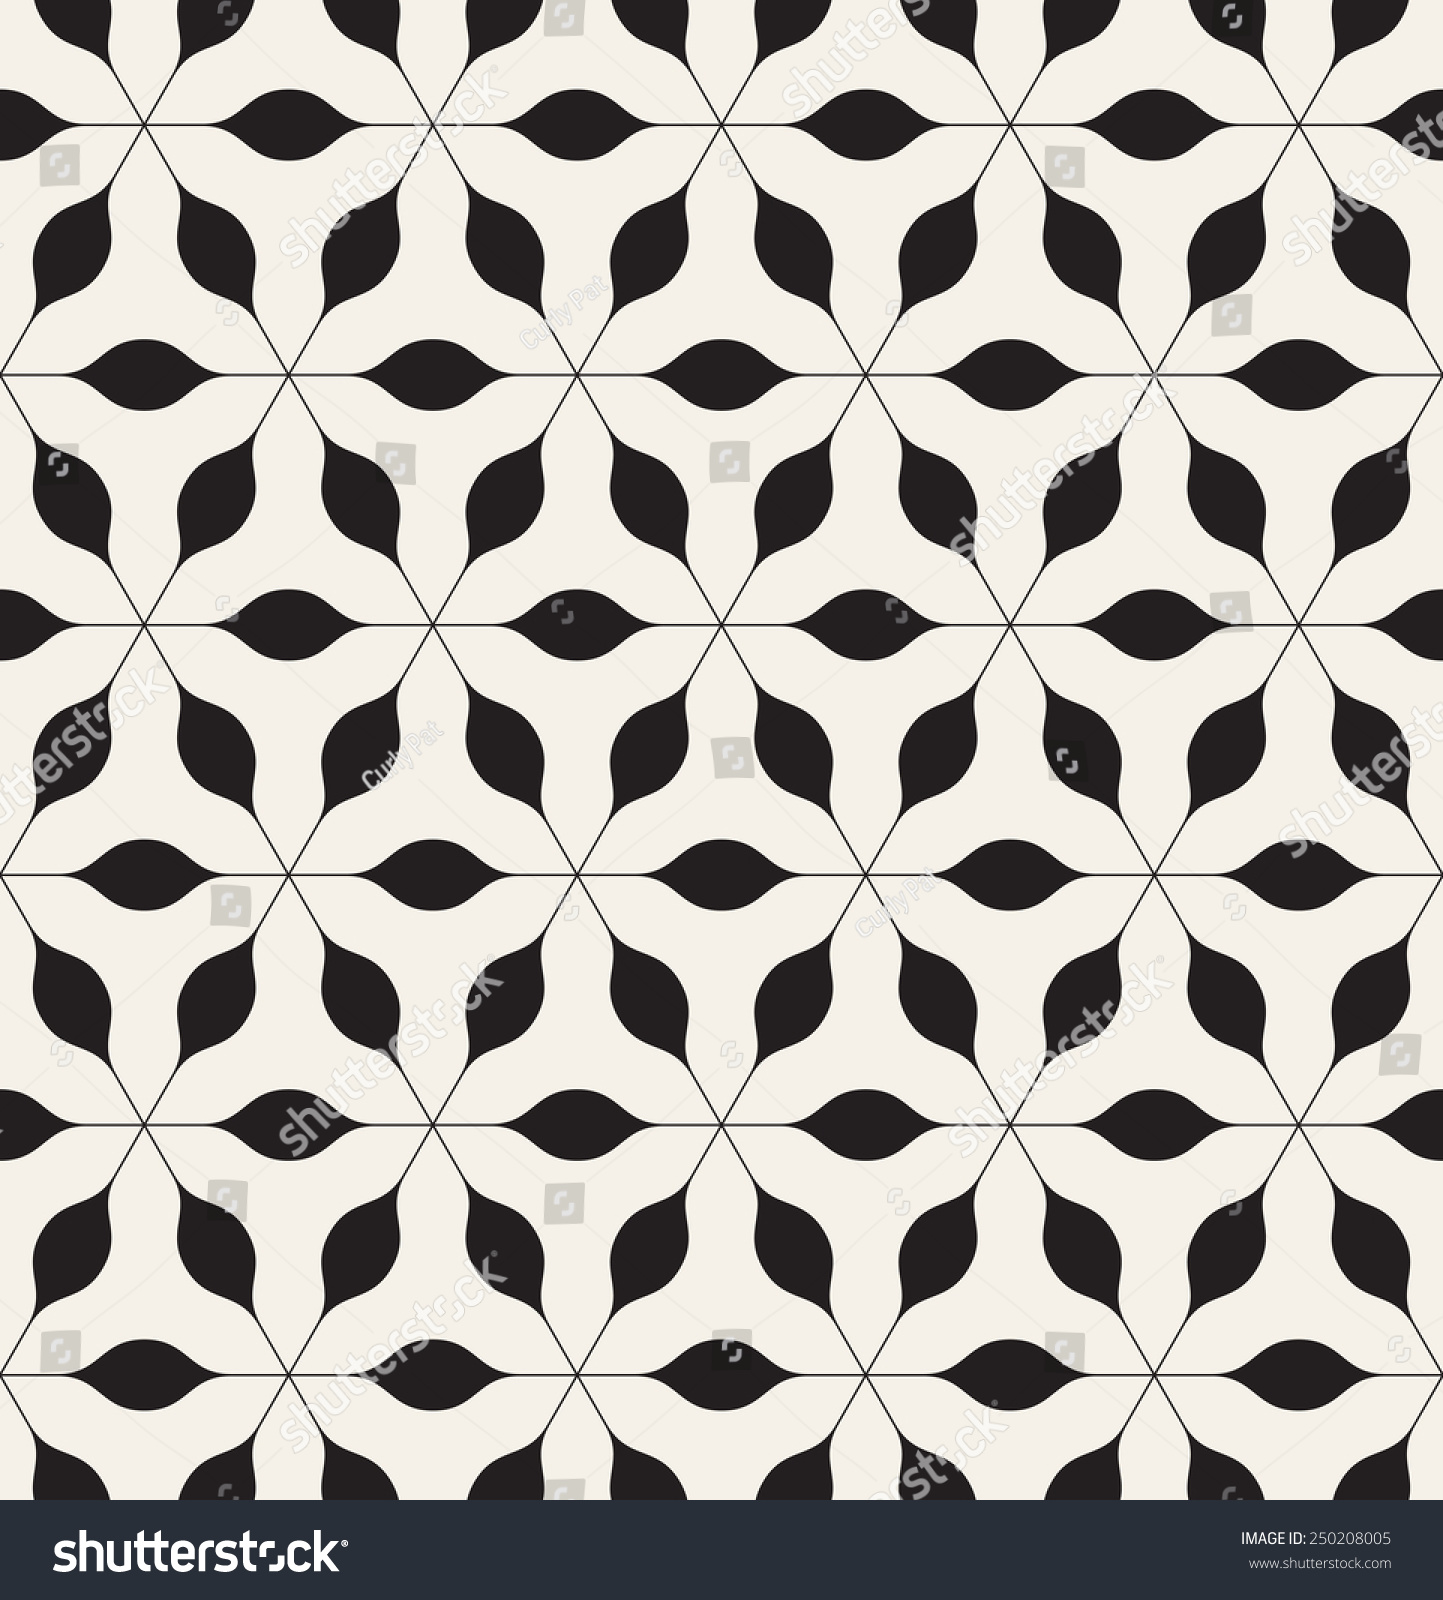 Aninimal Book: Seamless Geometric Pattern. Geometric Simple Print. Vector ...